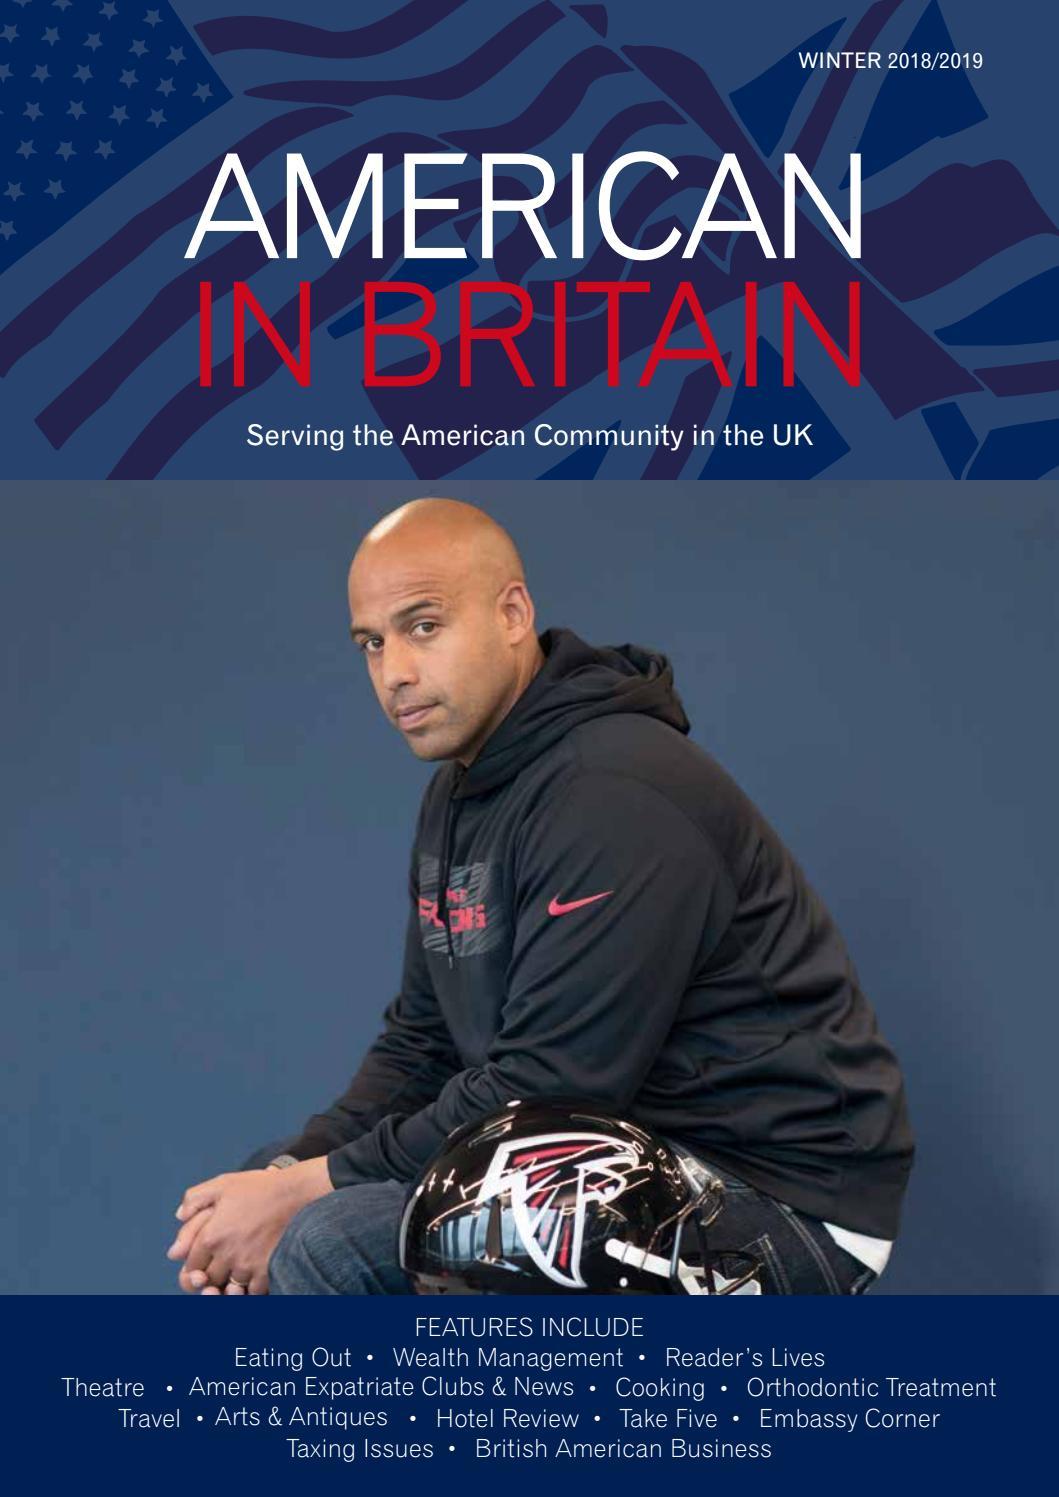 cbd441e851 American in Britain Winter 2018-2019 by American in Britain magazine and  The American Hour website - issuu